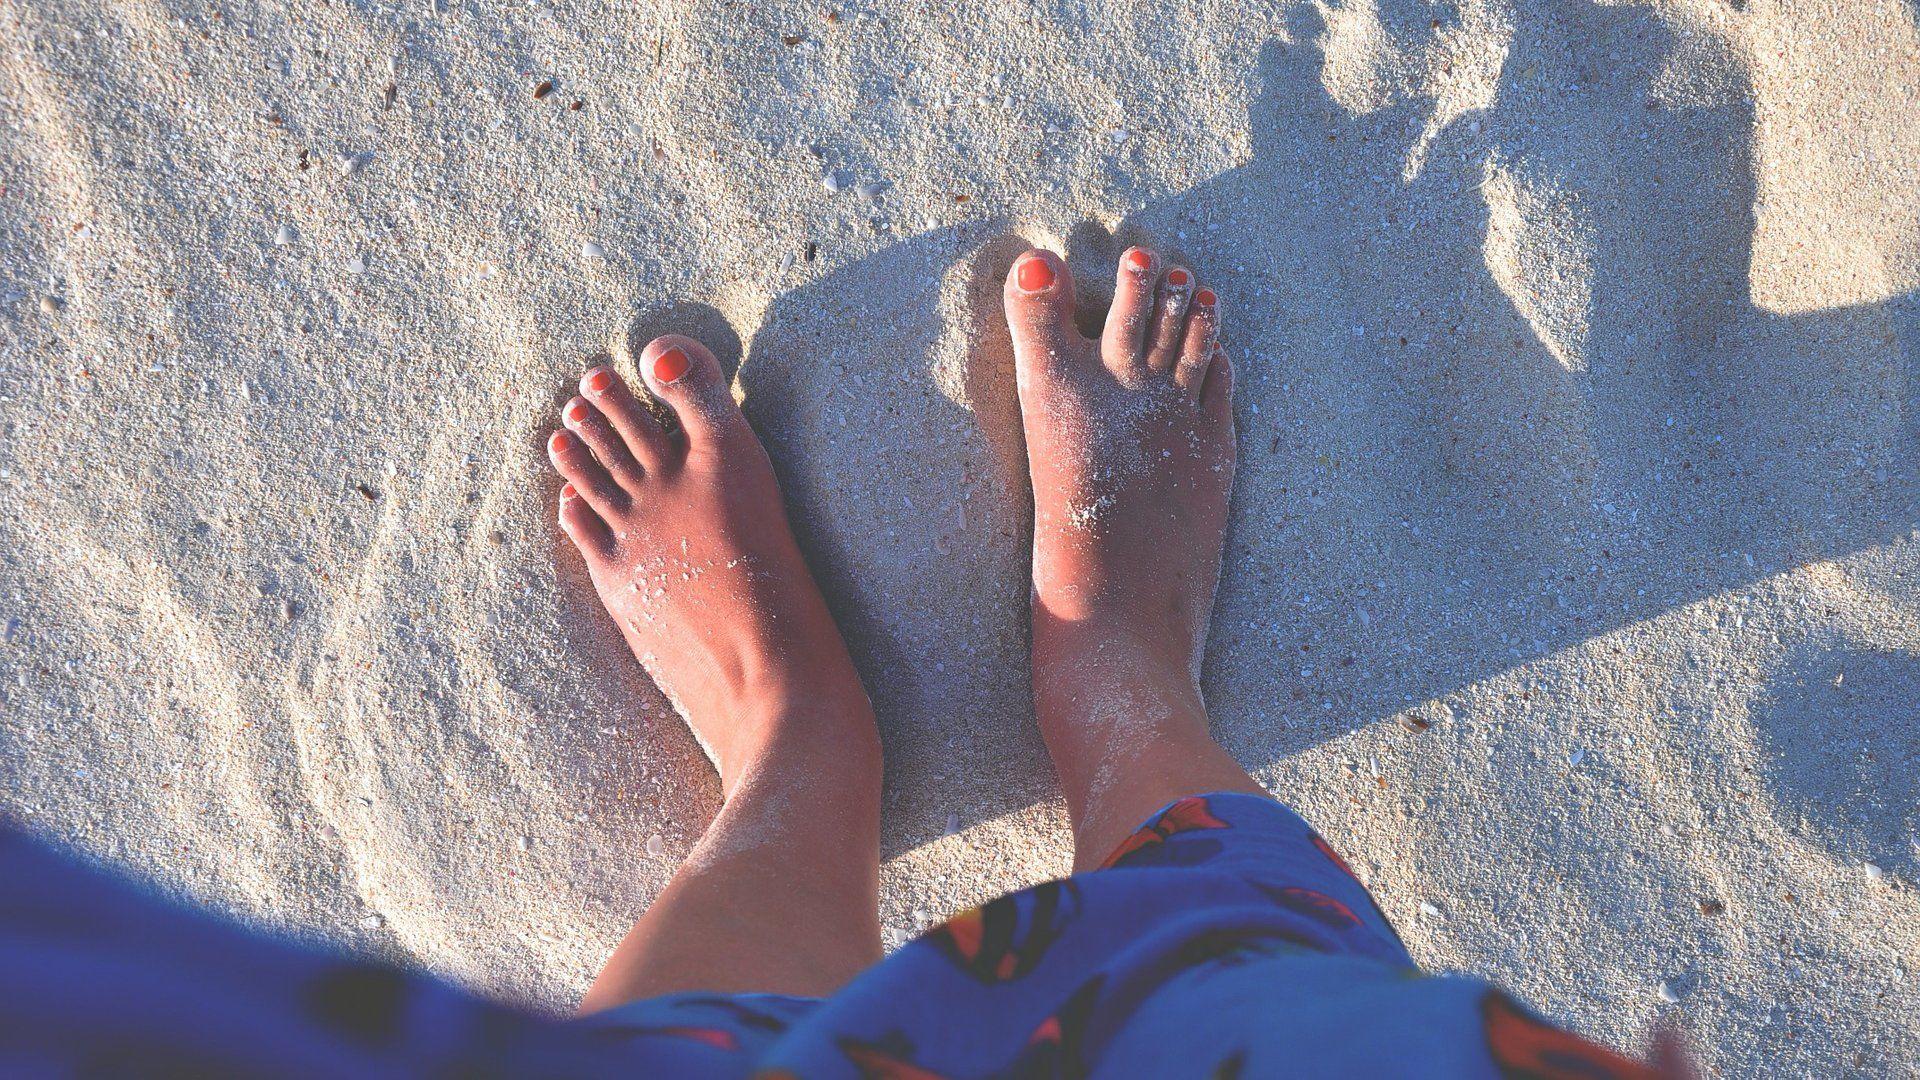 homokos tengerpart láb